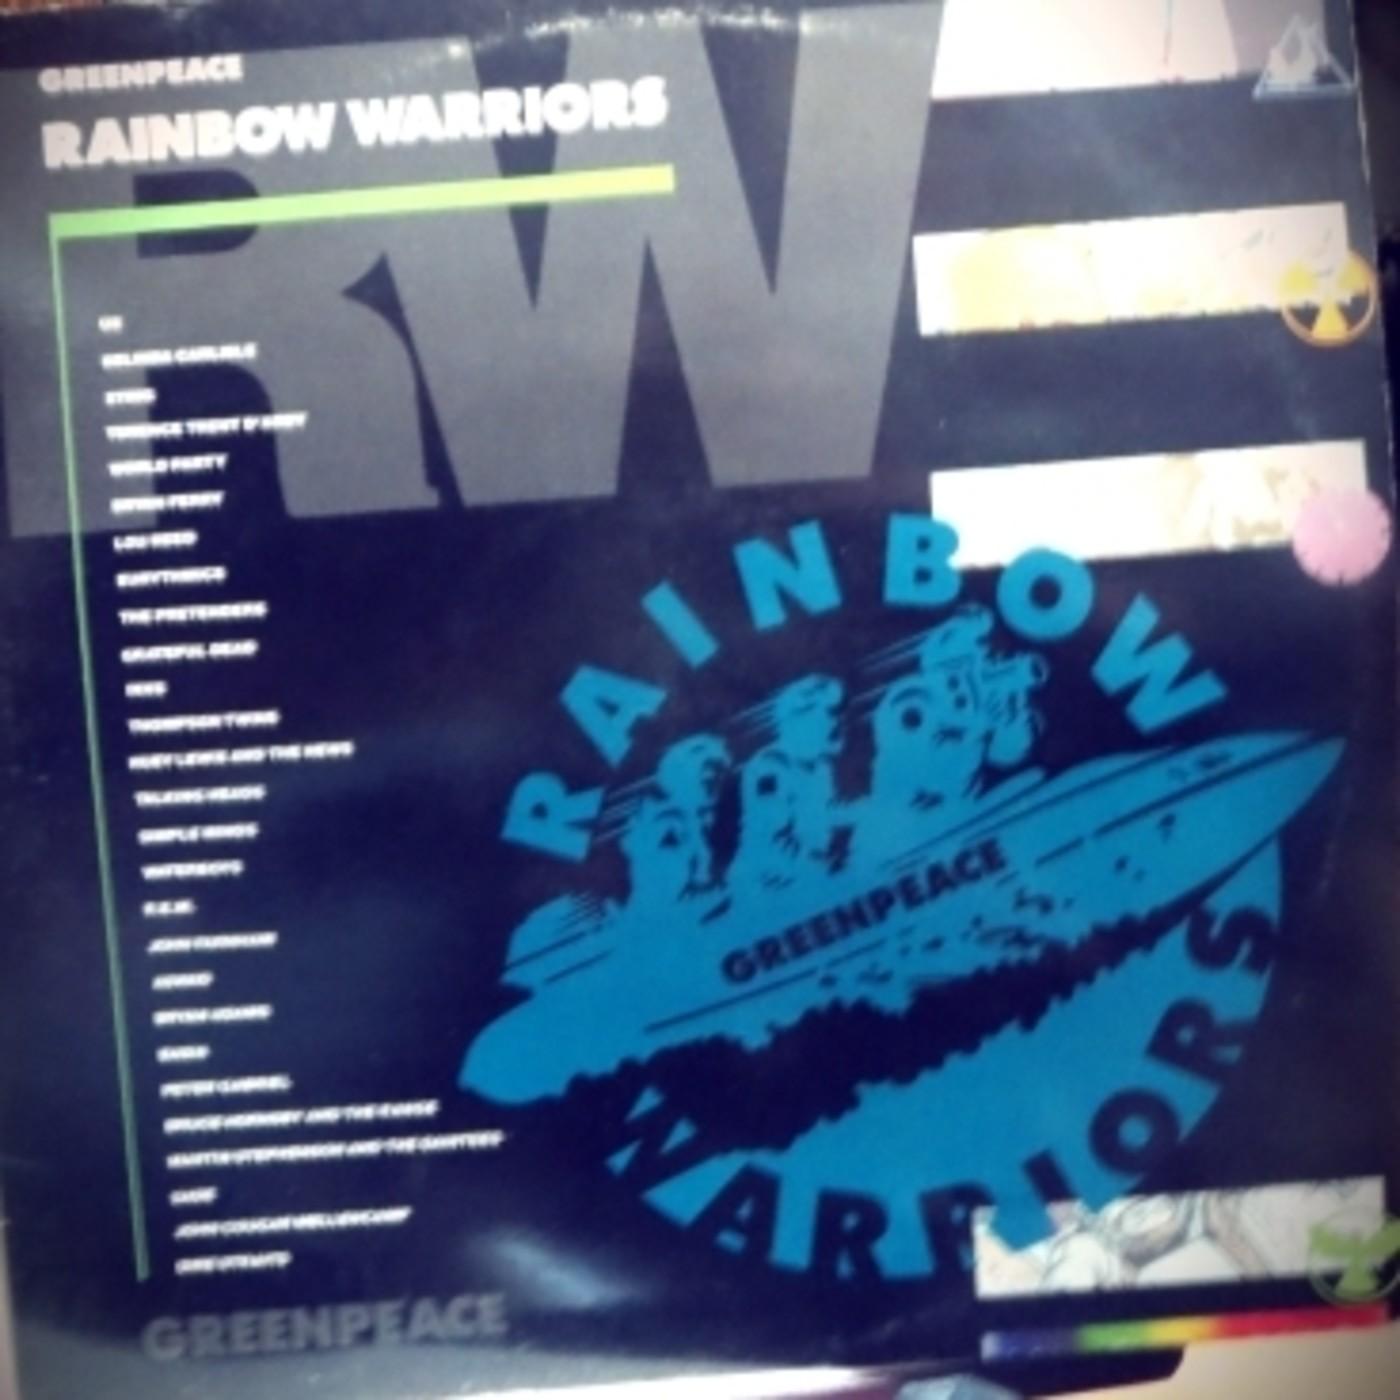 Warriors Of The Rainbow 2 Vietsub: Greenpeace: Rainbow Warriors -De Vinilo-Lp 2.completo.1989